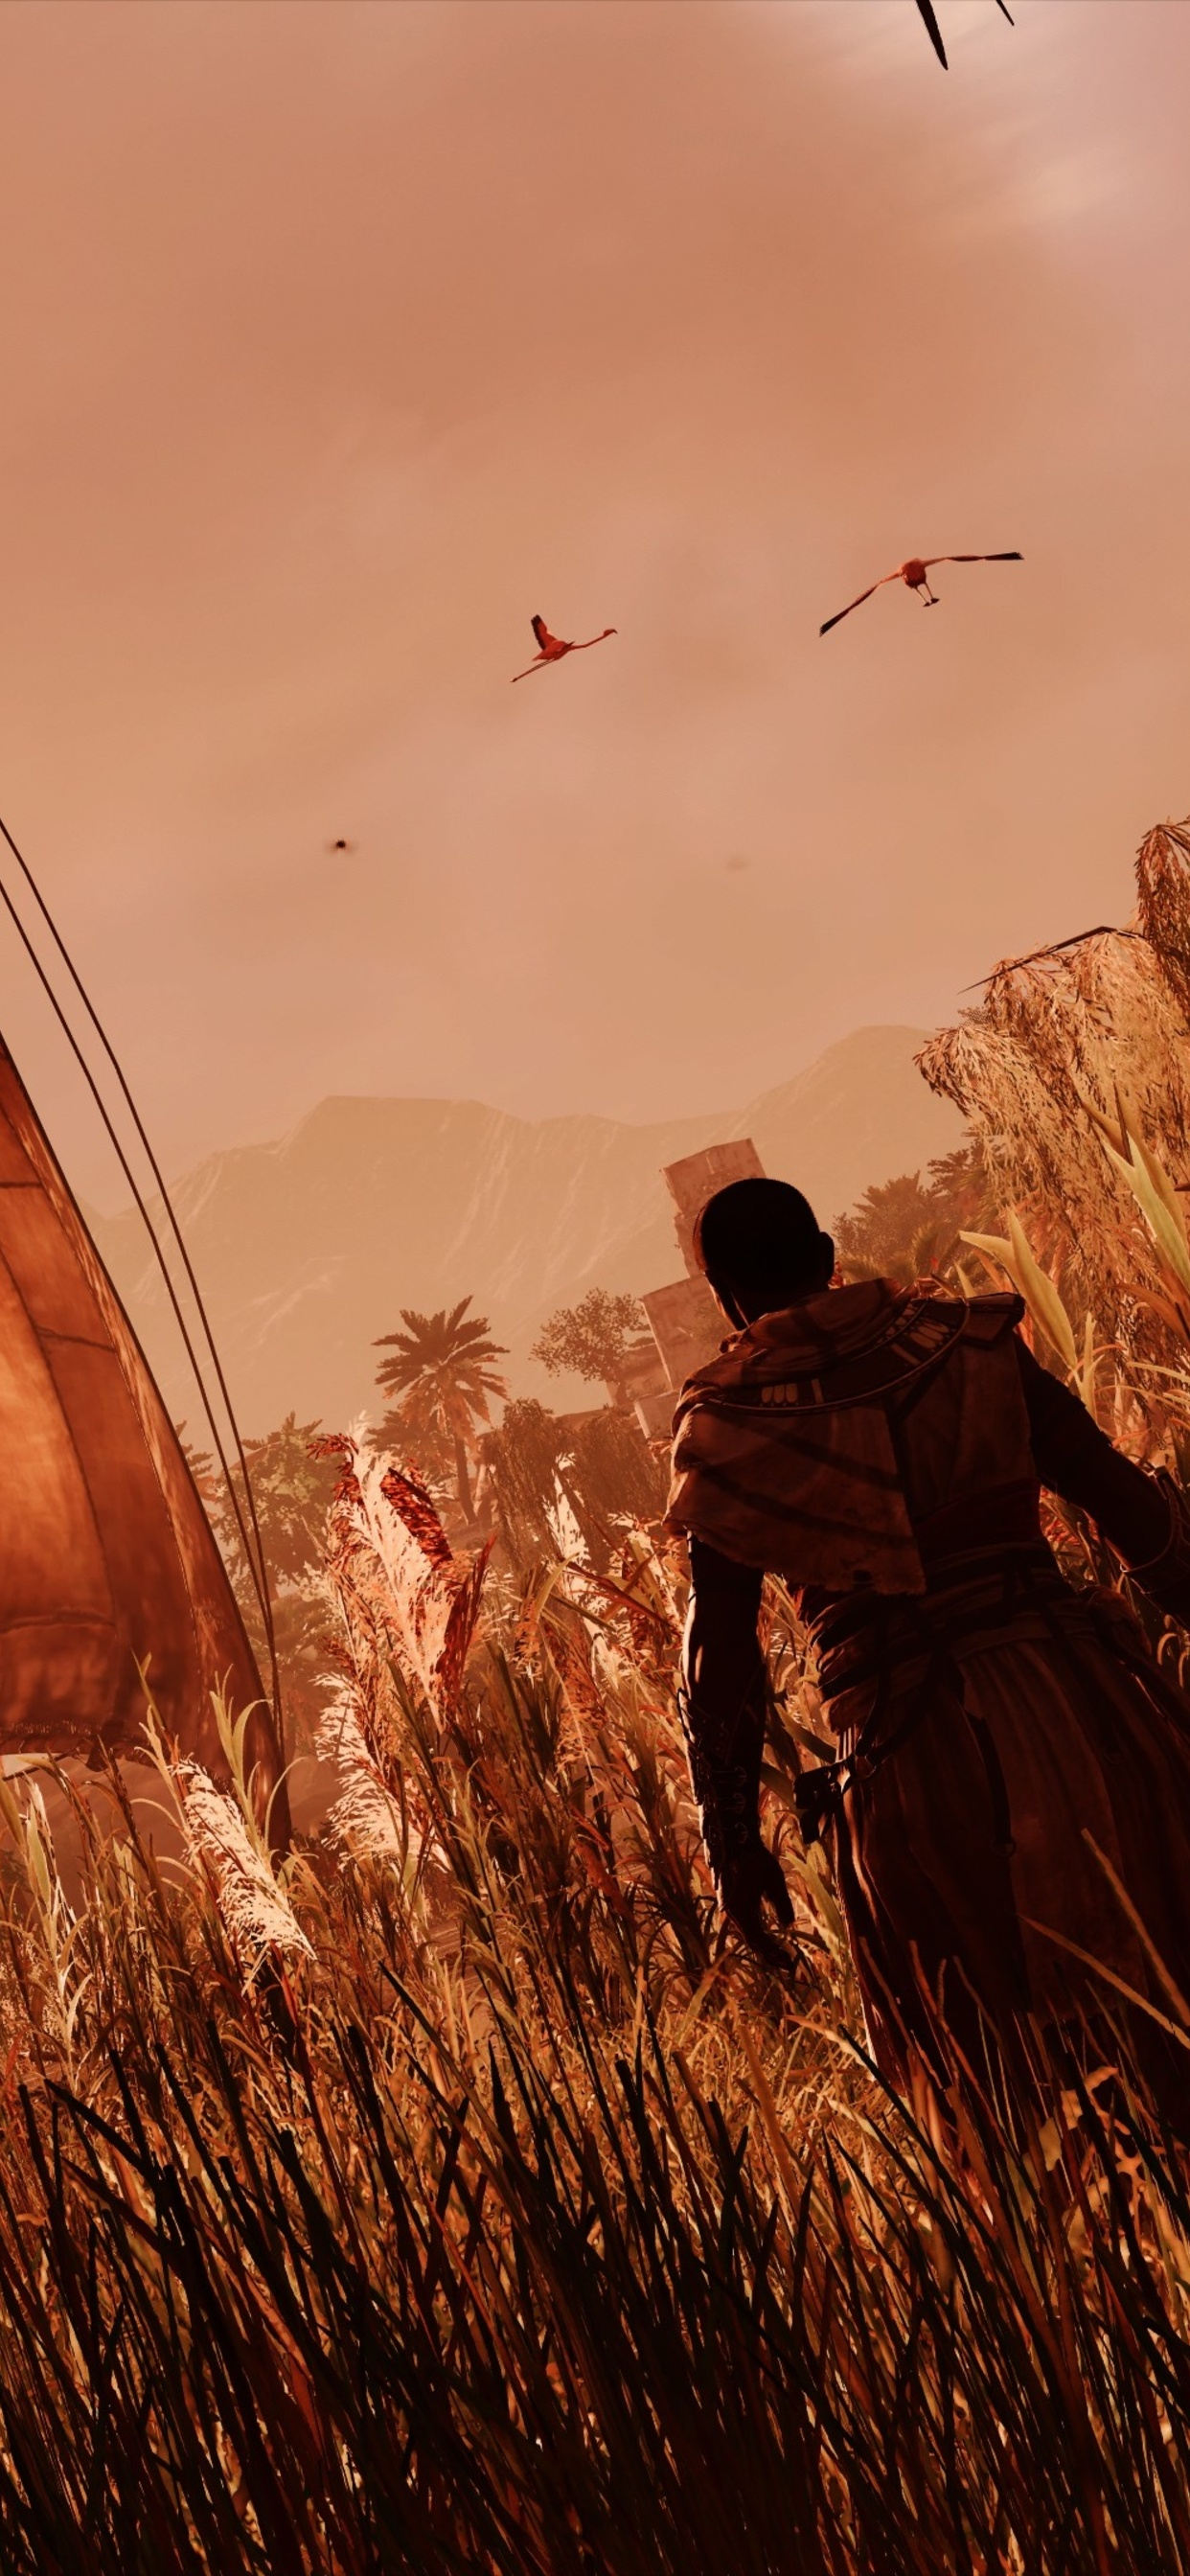 1242x2688 Assassins Creed Origins Egypt 4k Iphone Xs Max Hd